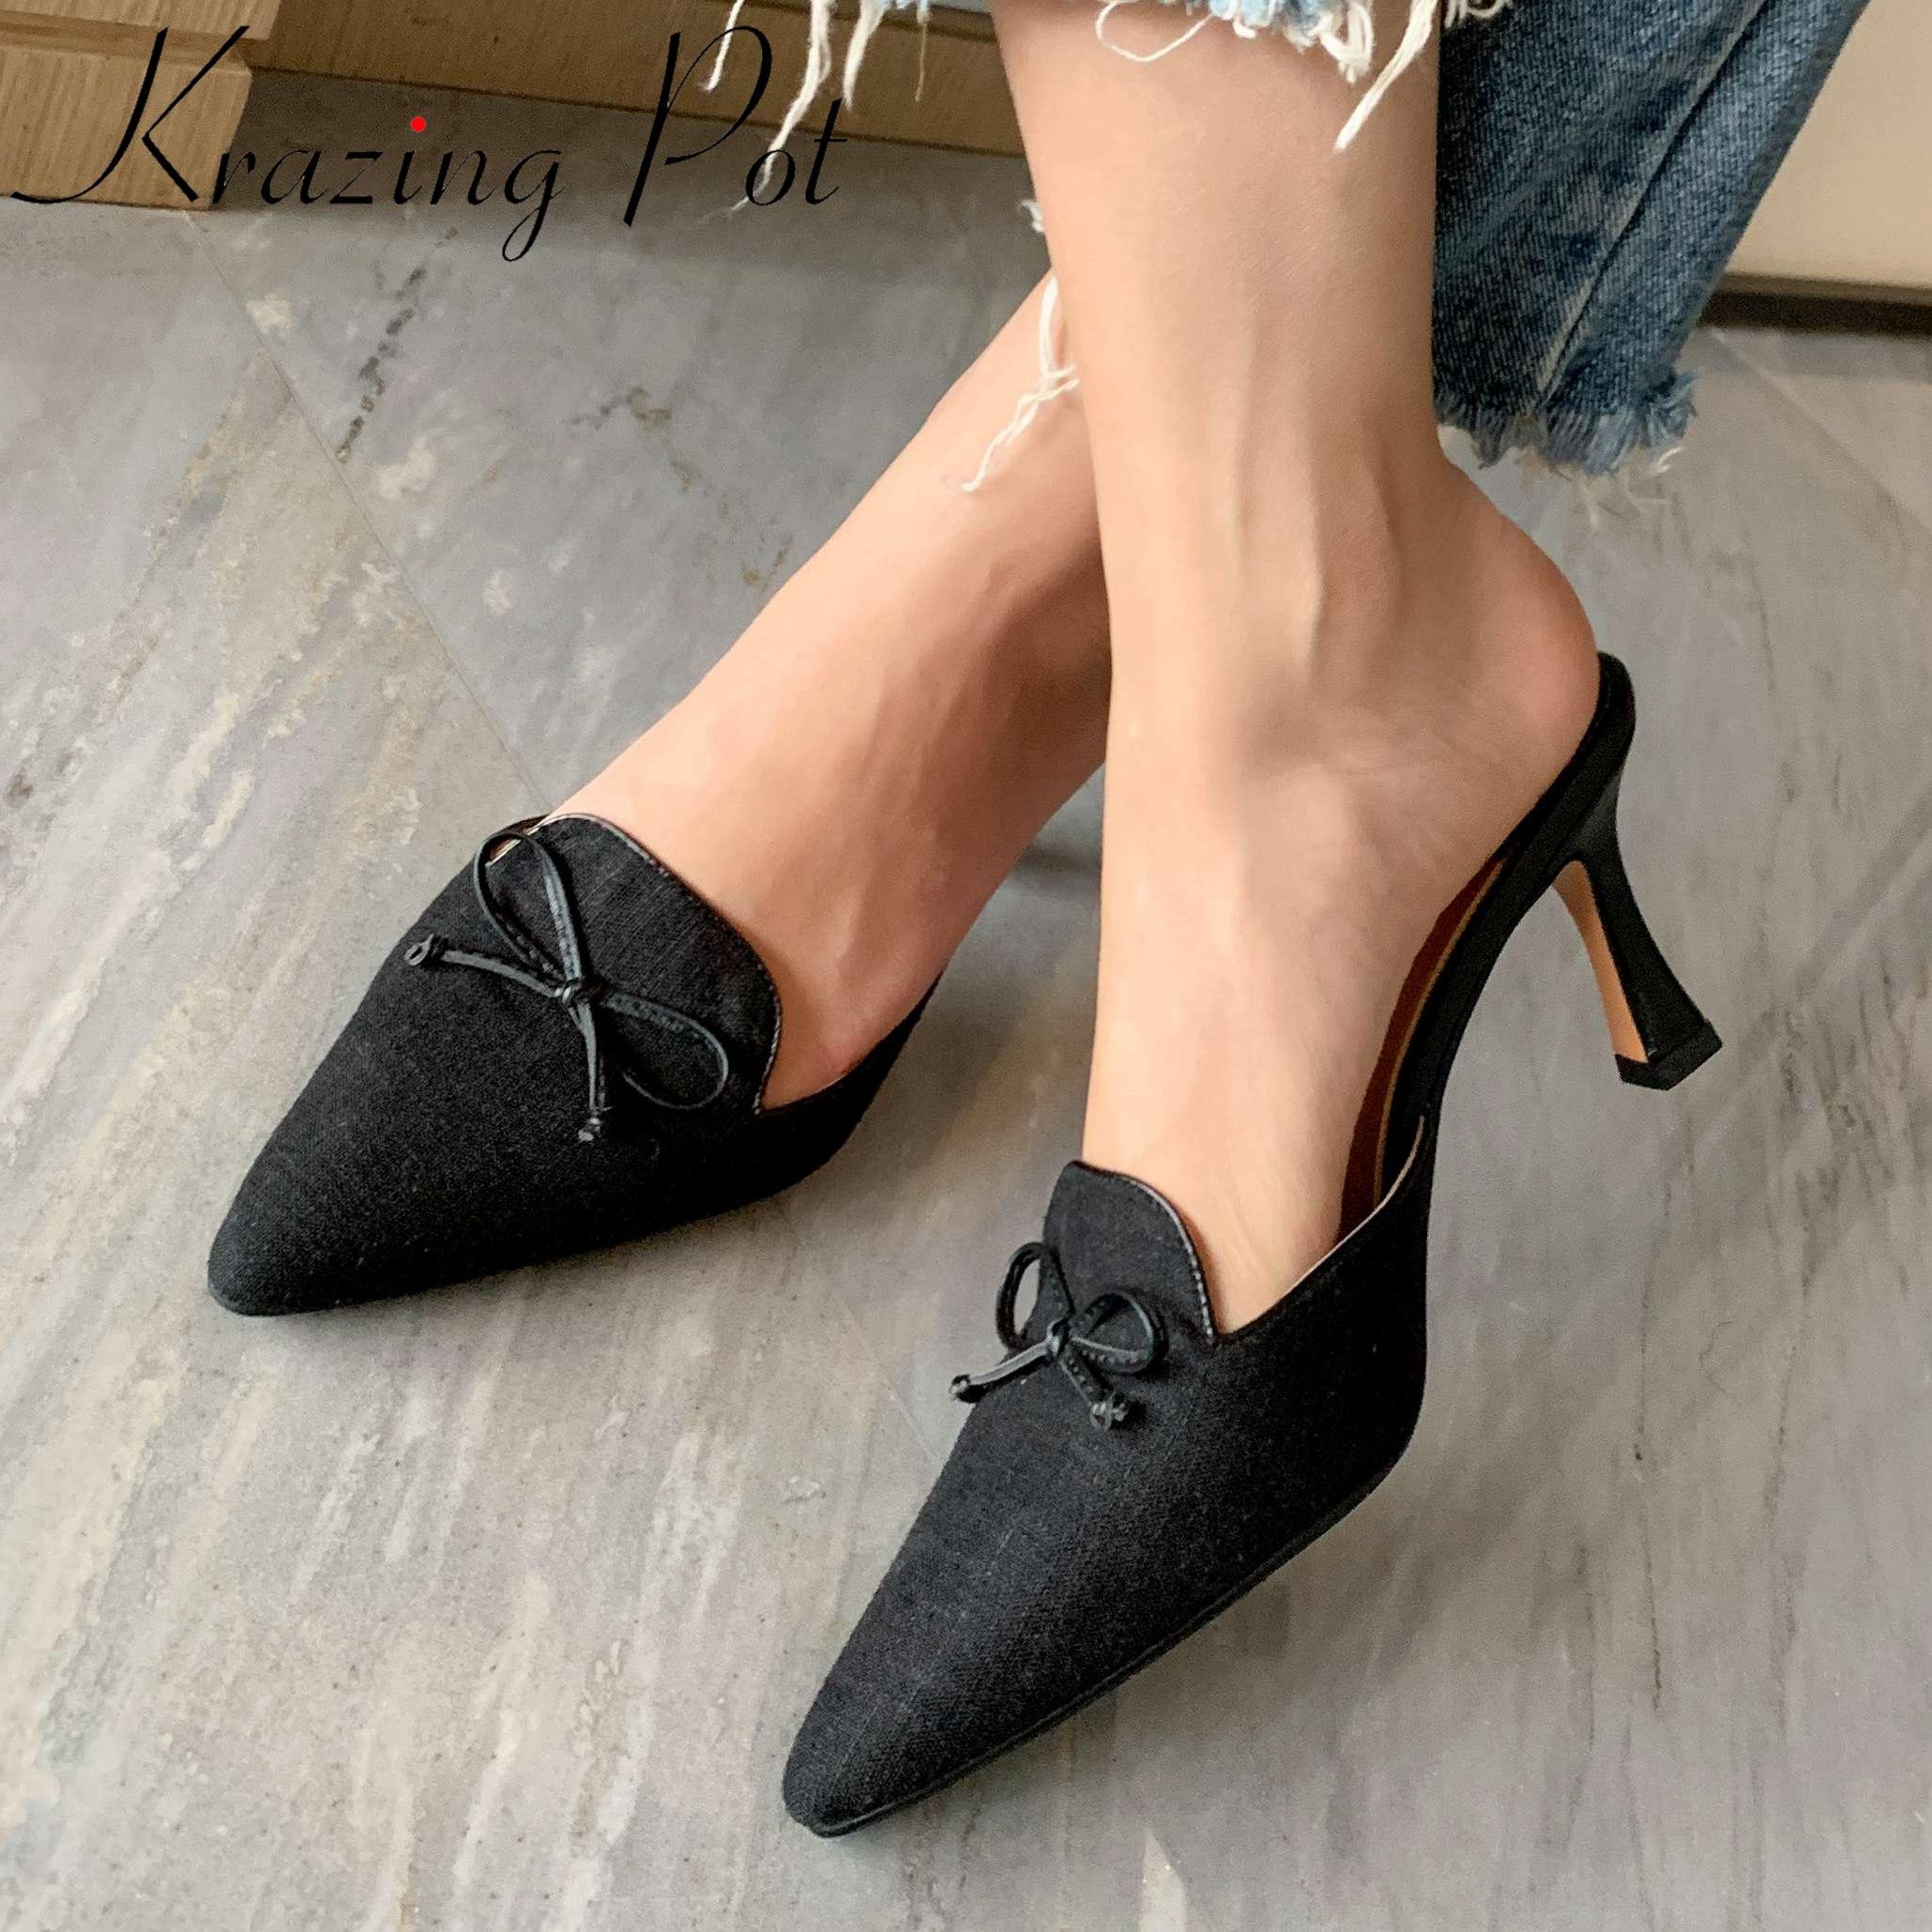 Krazing pot special cloth cozy women shoes pointed toe high heels slip on mules bowtie maiden Korean streetwear summer pumps L99